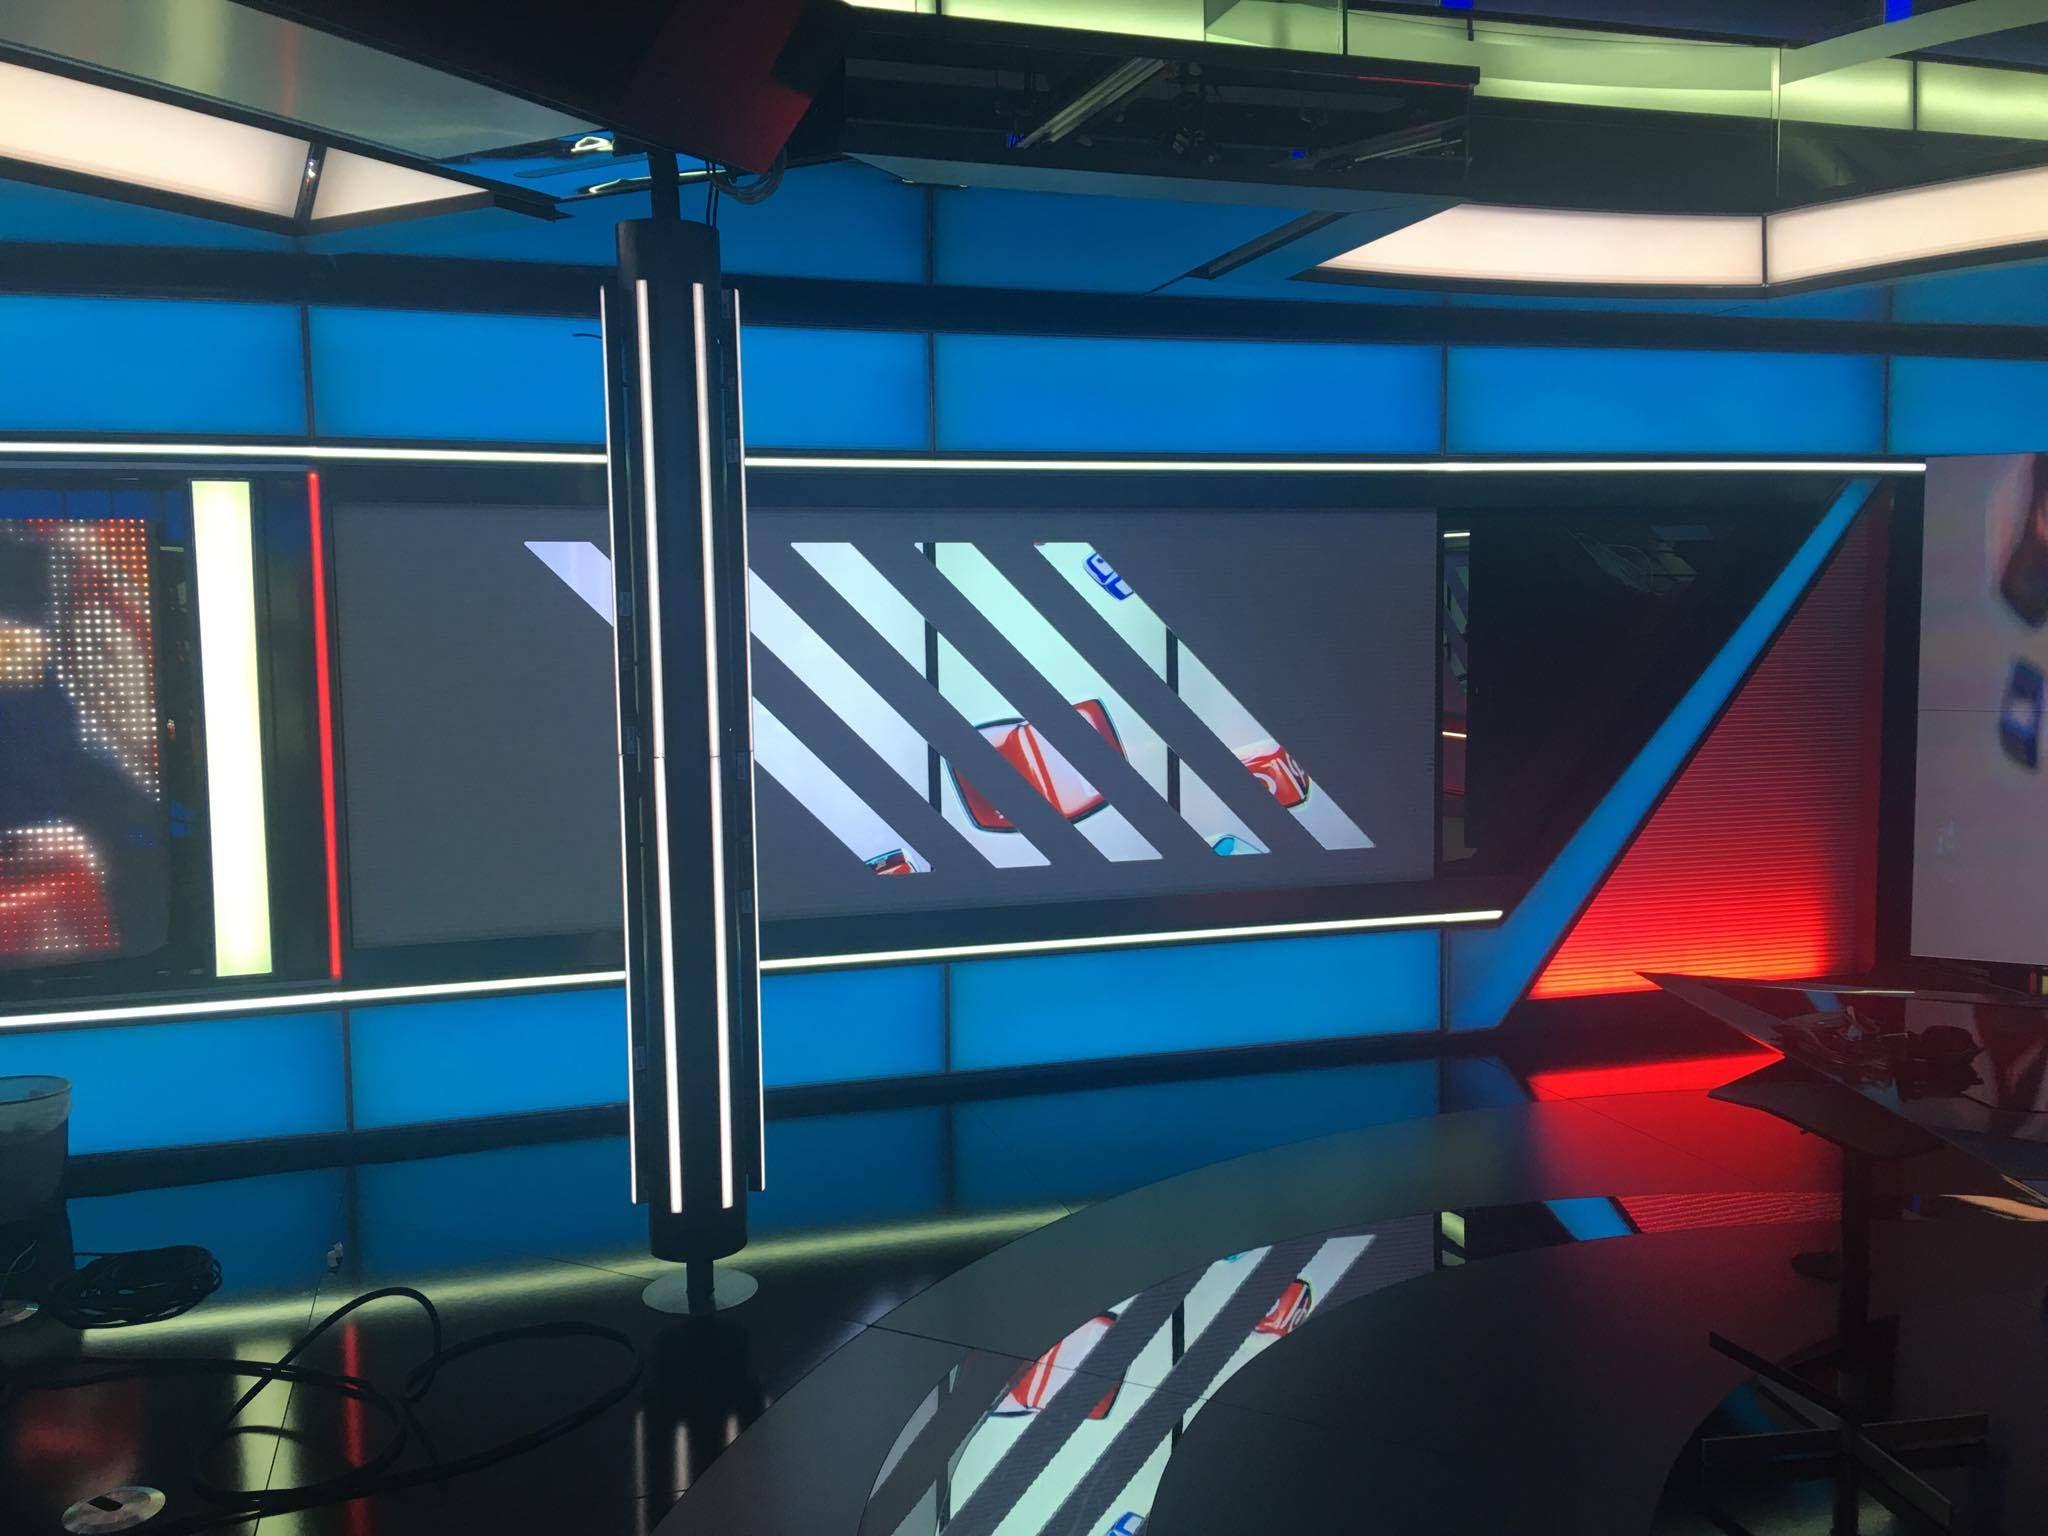 Al Arabiya's new state-of-the-art studio